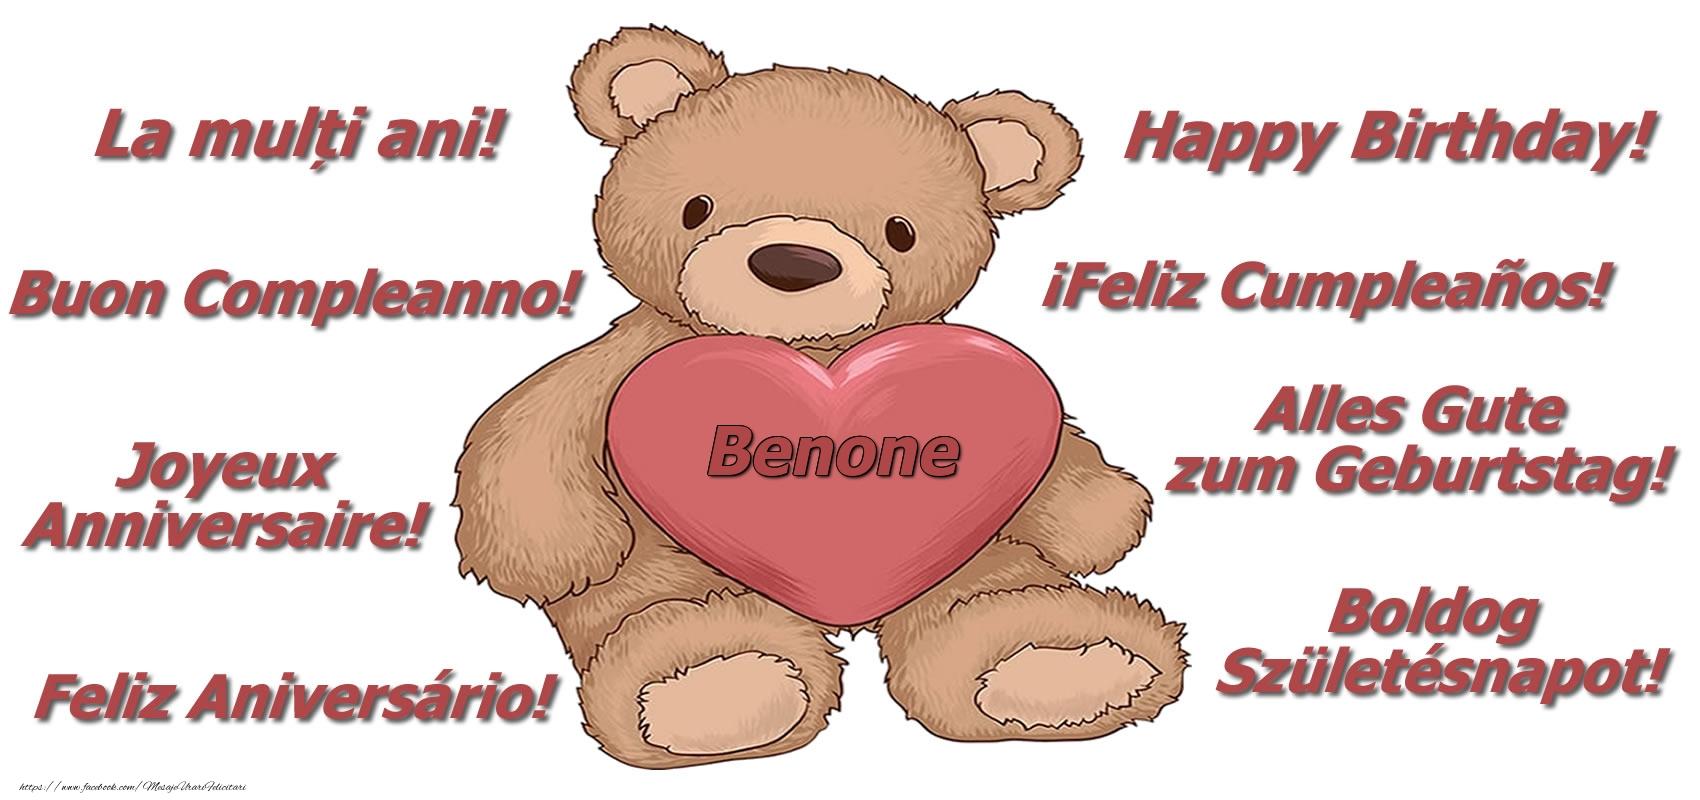 Felicitari de zi de nastere - La multi ani Benone! - Ursulet